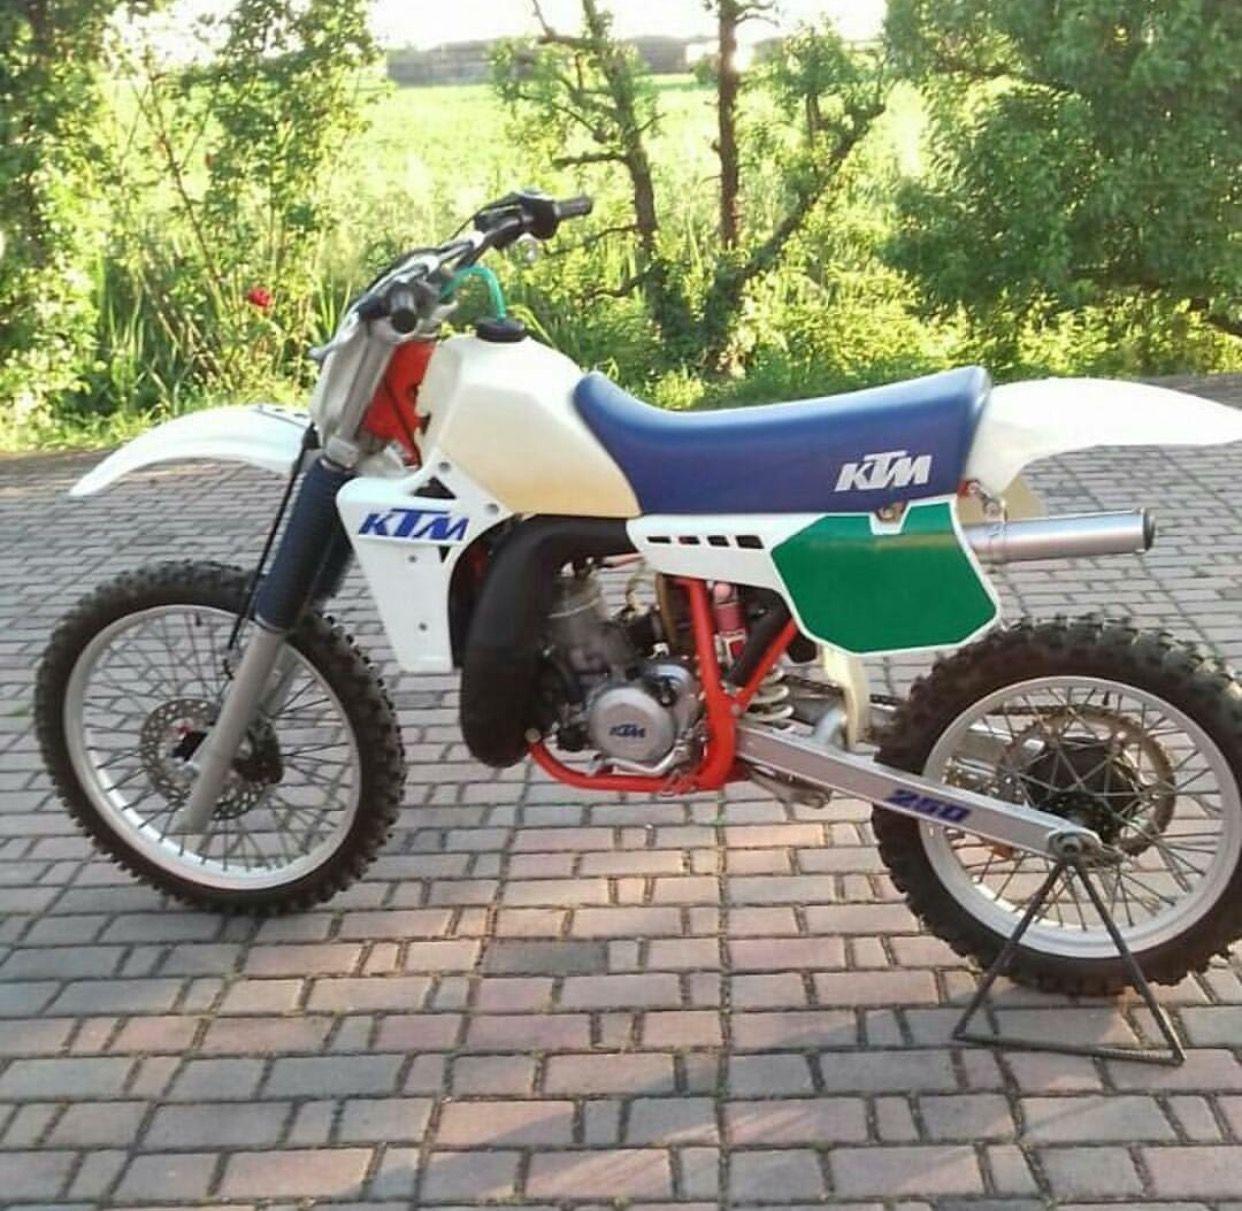 Pin By Scott Gaubatz On Ktm Dirtbikes Riders Vintage Motocross Ktm Vintage Bikes